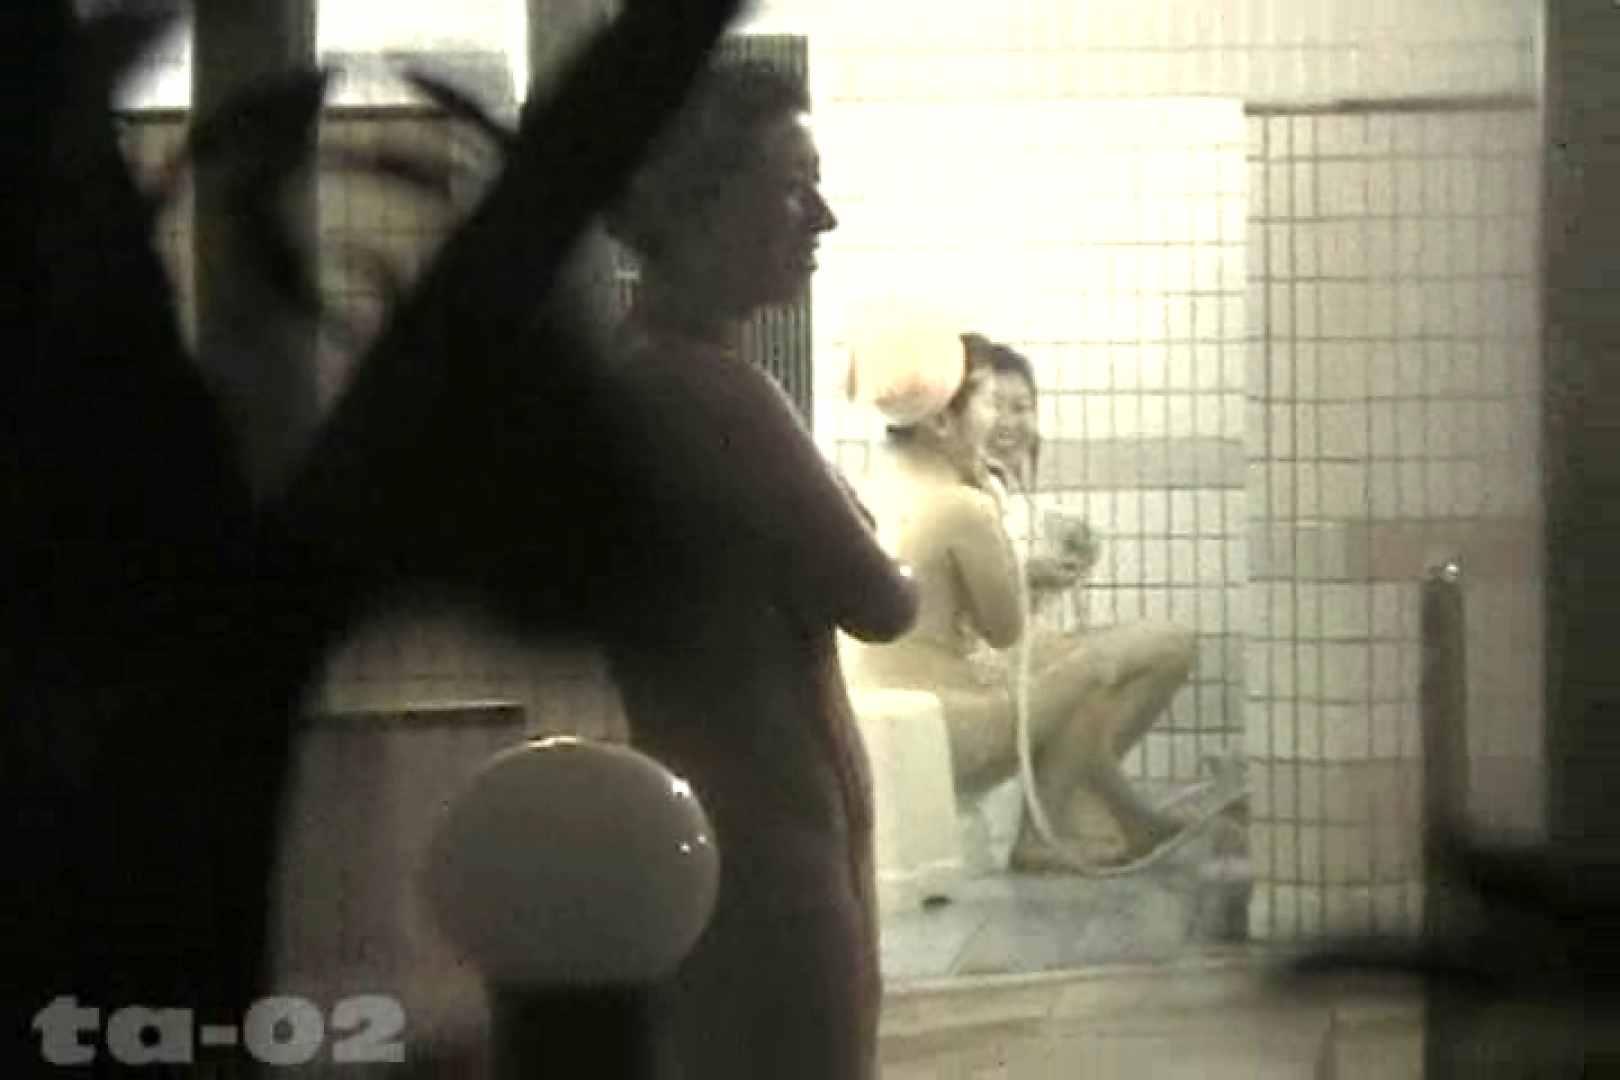 合宿ホテル女風呂盗撮高画質版 Vol.02 盗撮  81PIX 75